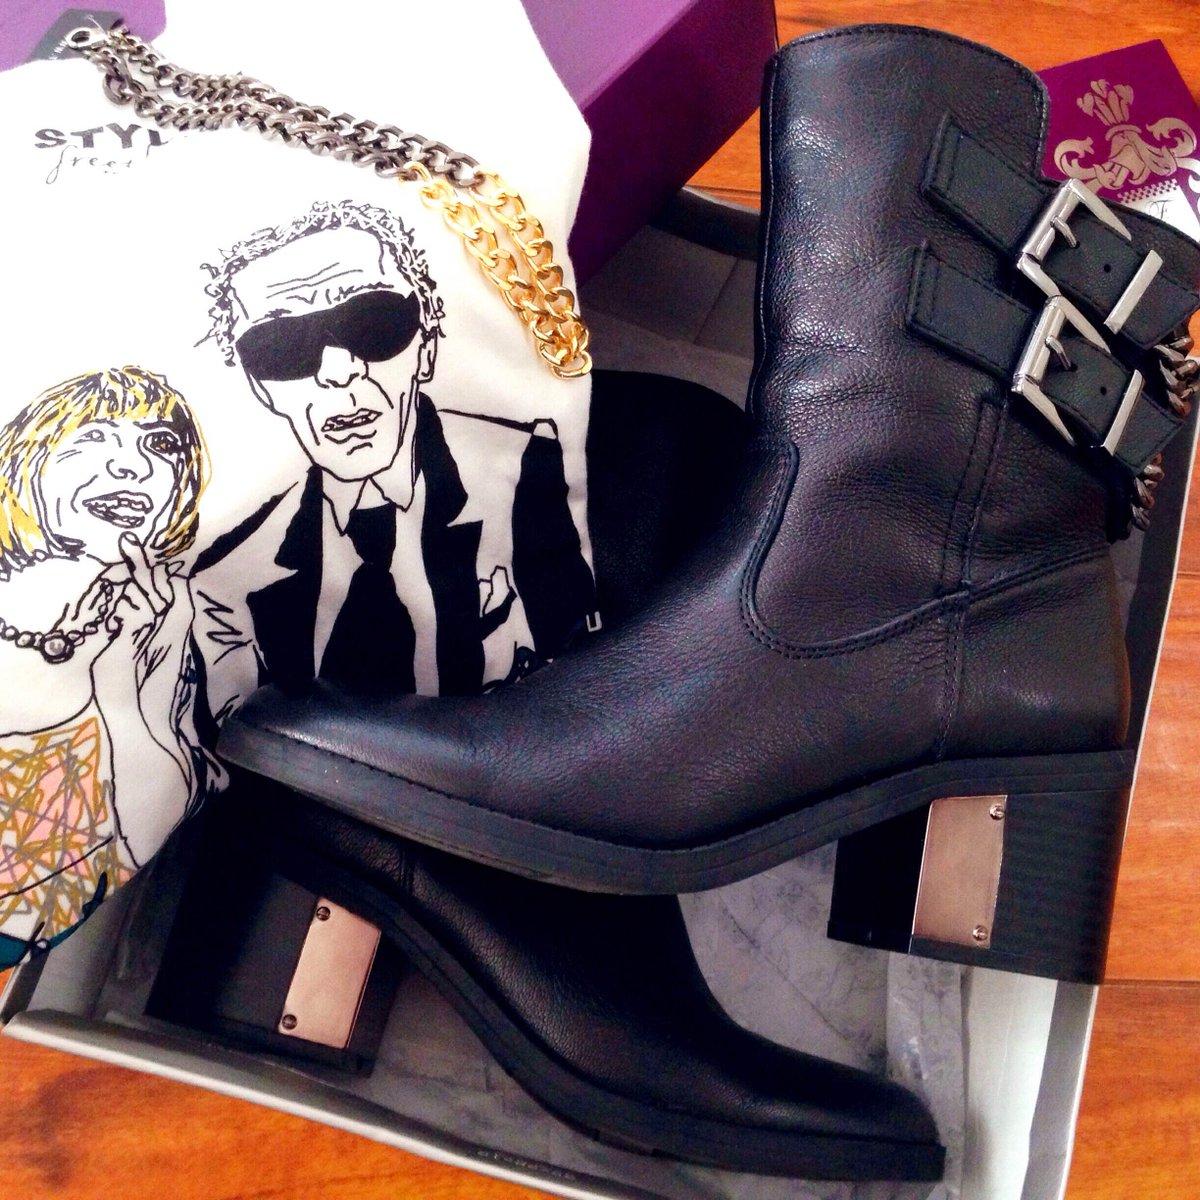 RT @FergieFootwear: #StylishFreethinker...SAVE 20% on #FergieFave WISTFUL #boots thru 11/26!#bootsale #motoboots https://t.co/hFQT90zRrR ht…